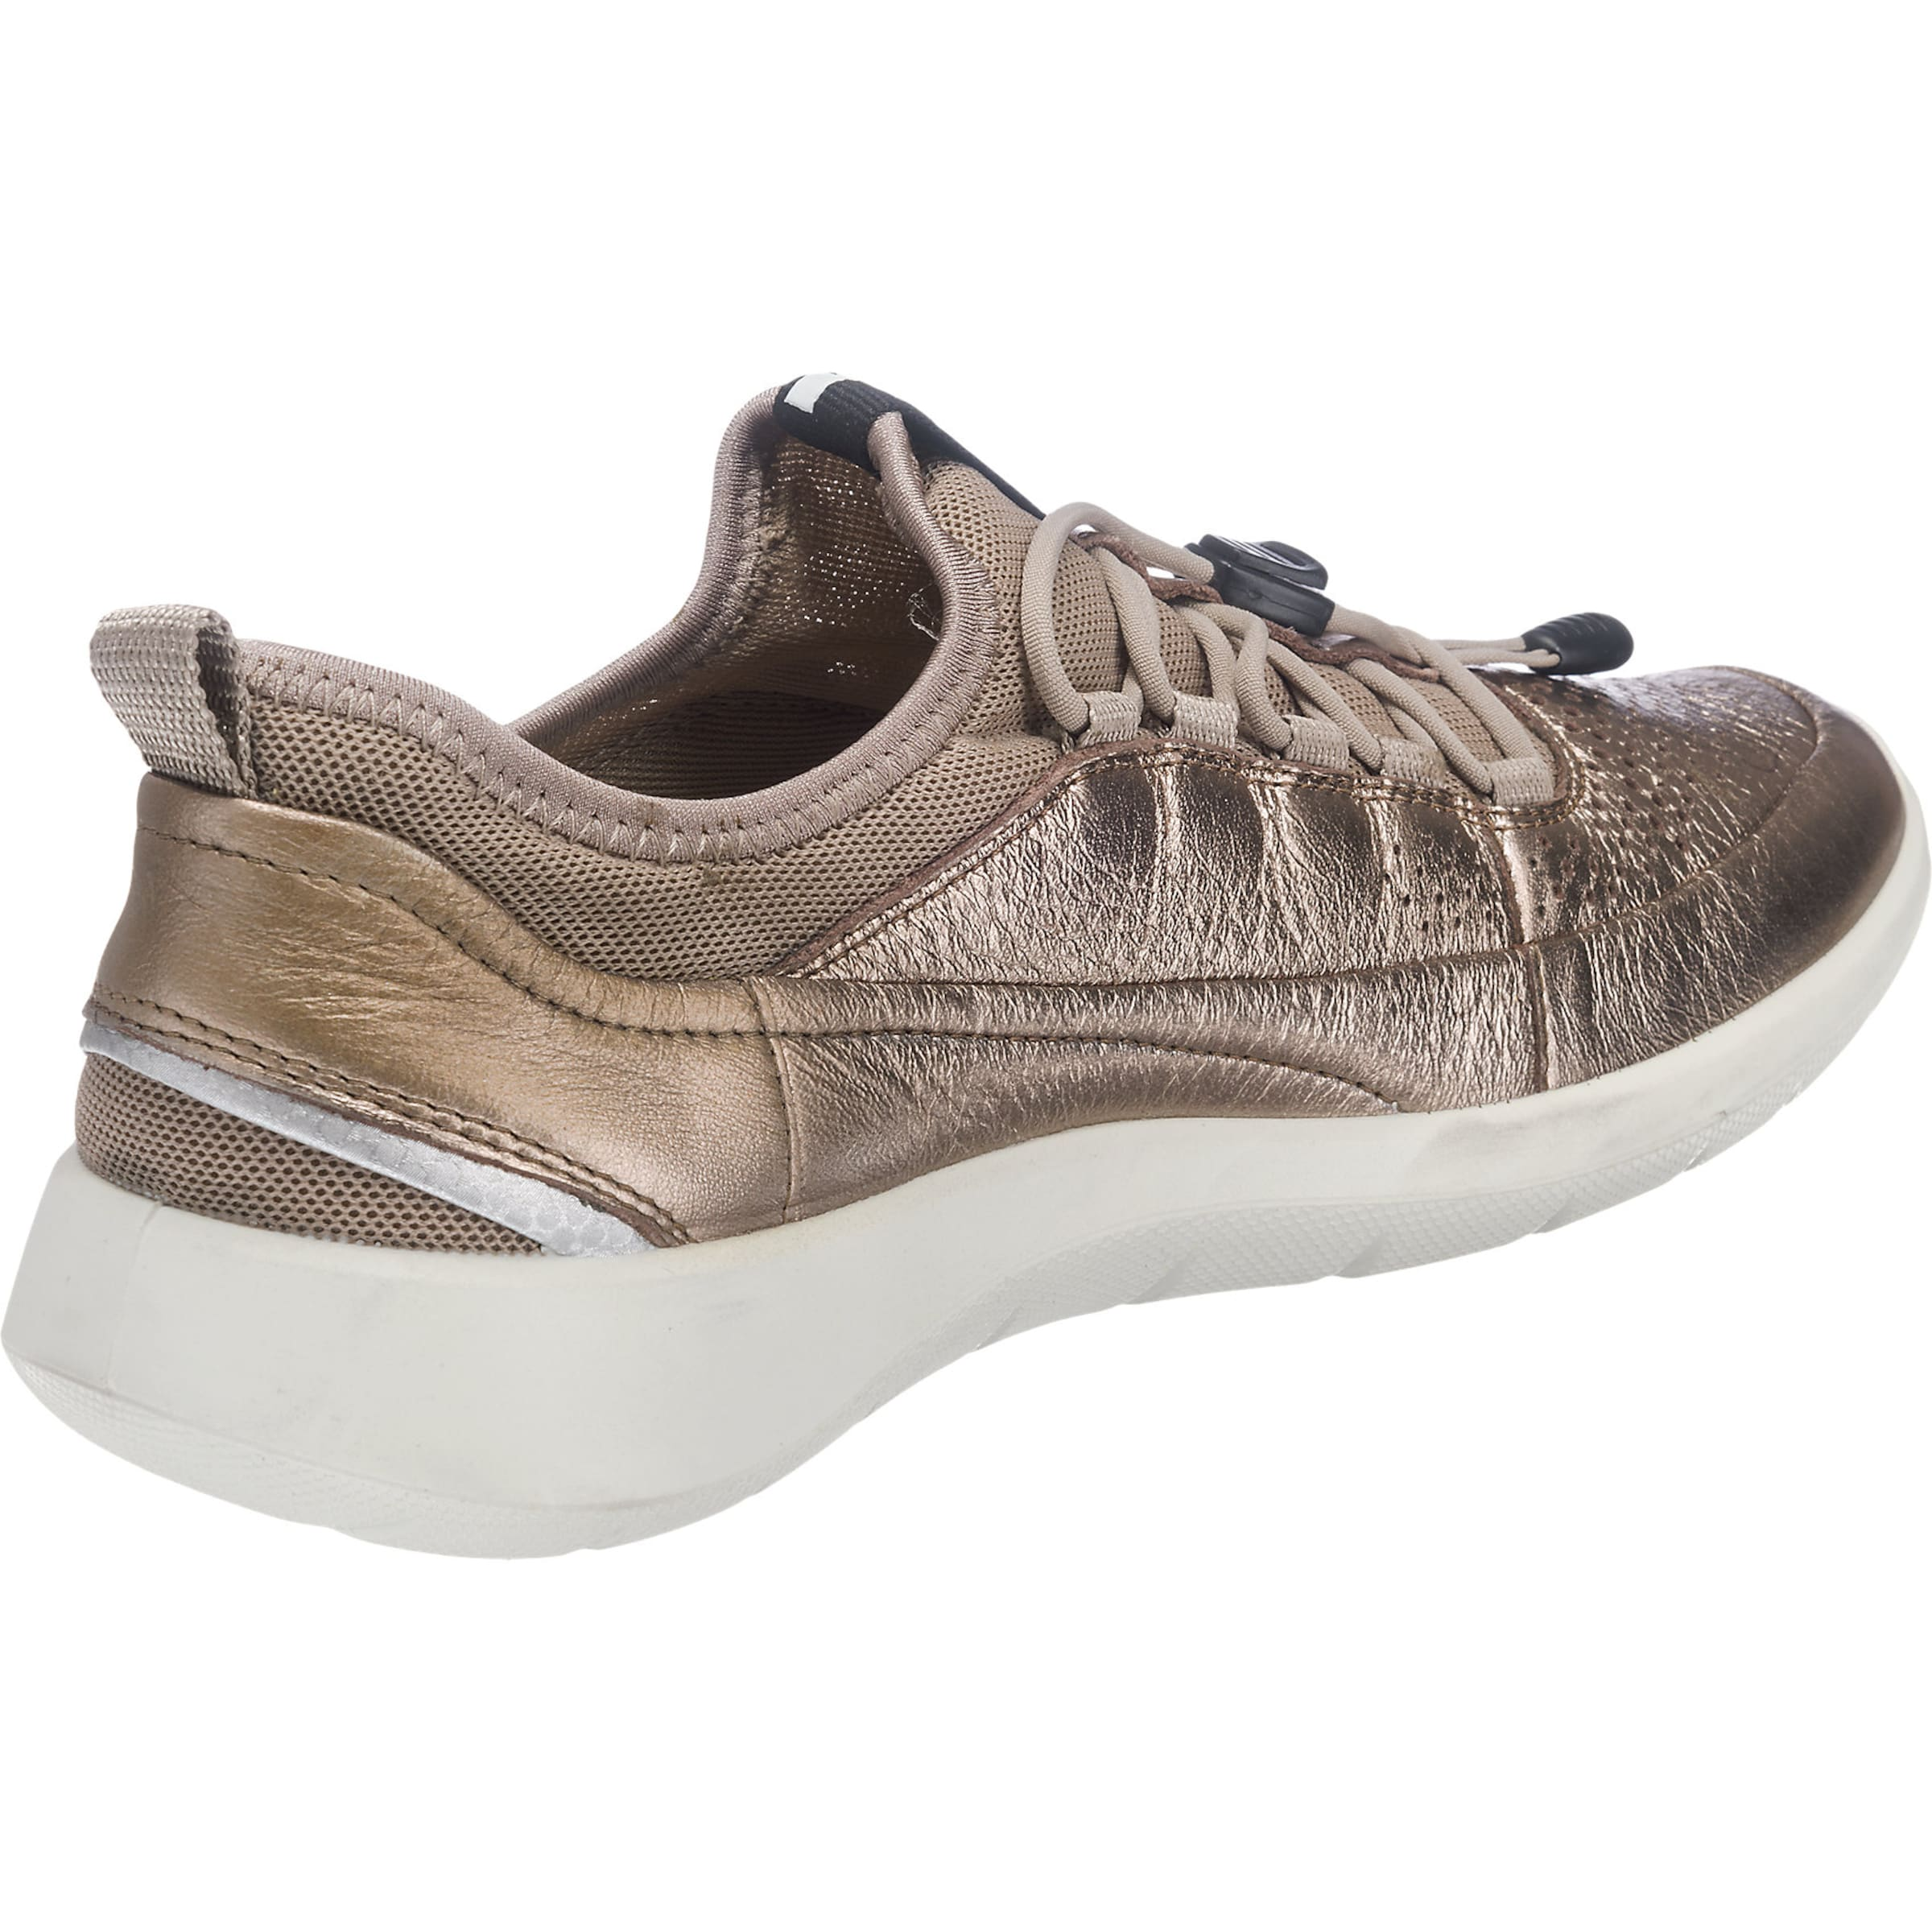 Outlet Rabatte Niedrige Versandgebühr Online ECCO Soft 5 Sneakers Rabatt 2018 hu03eX7u